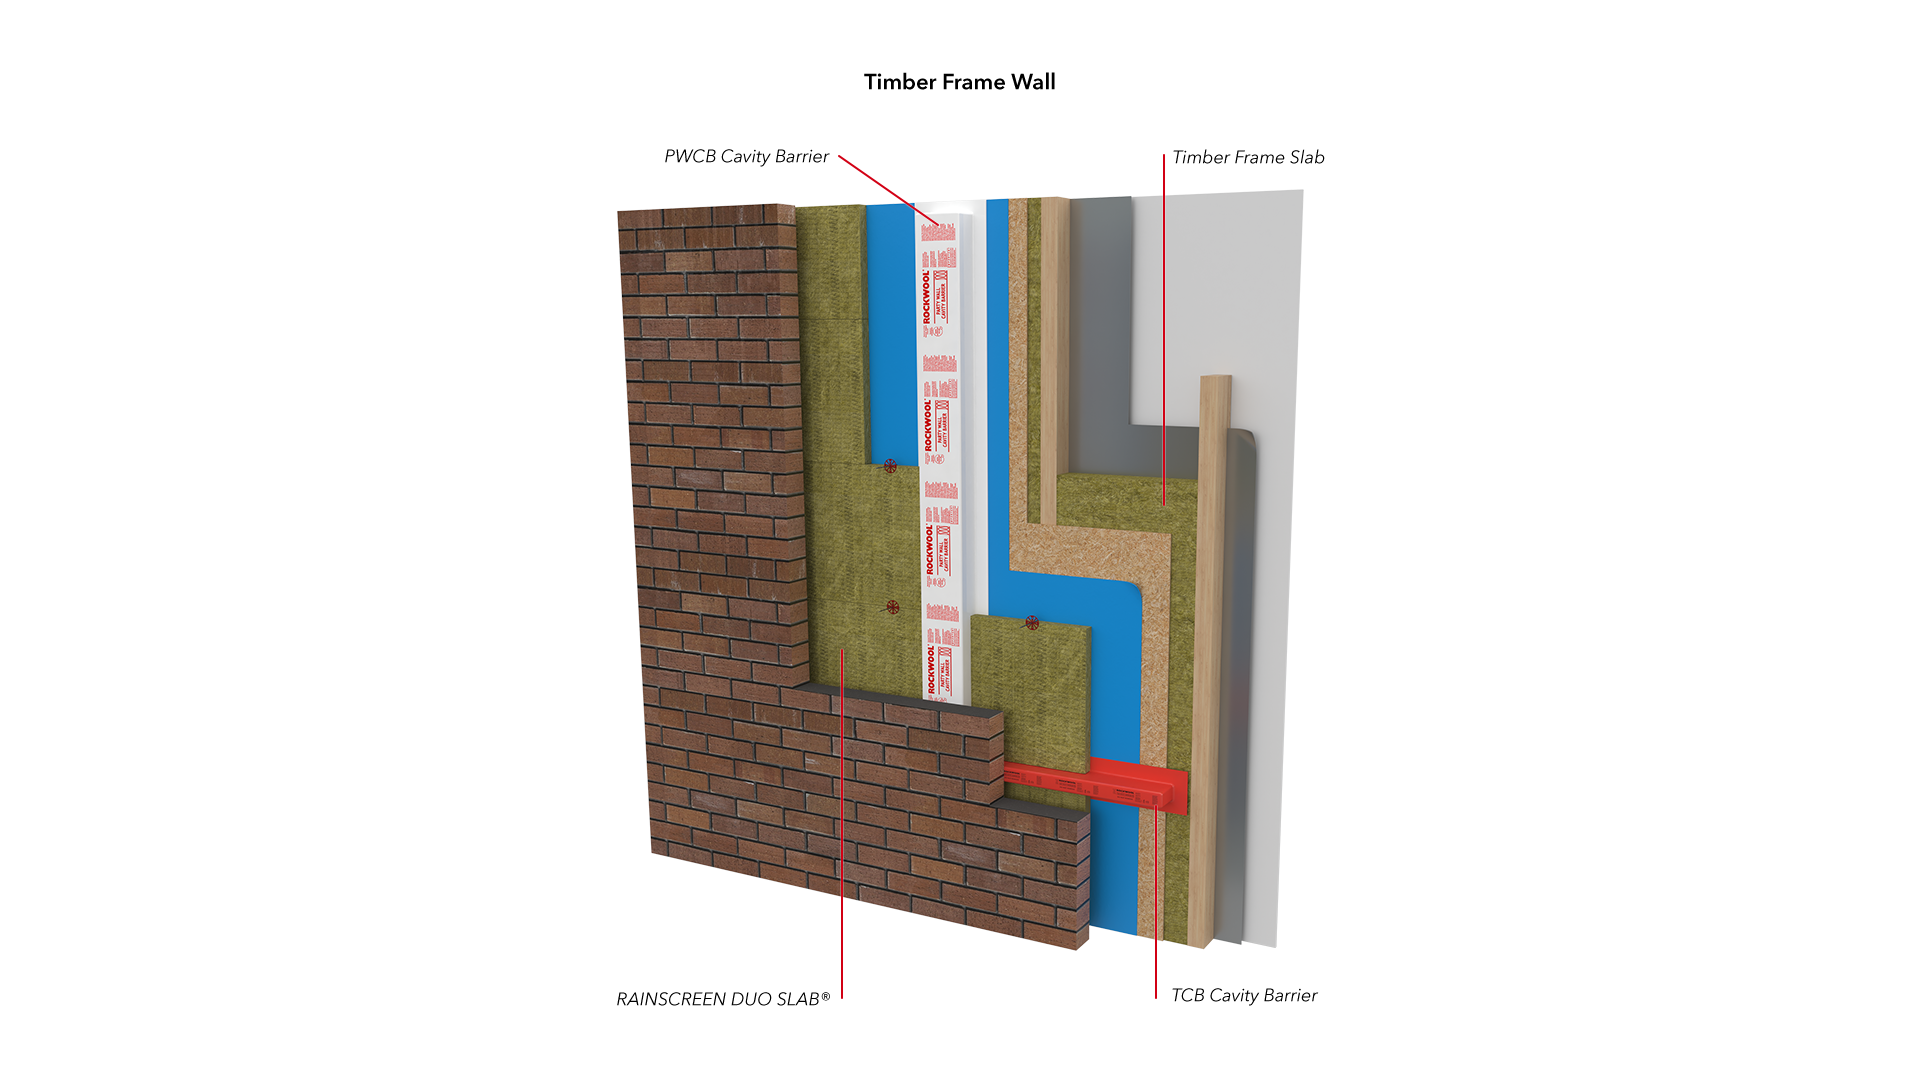 Timber Frame Wall - Timber Frame Slab, RAINSCREEN DUO, PWCB, TCB